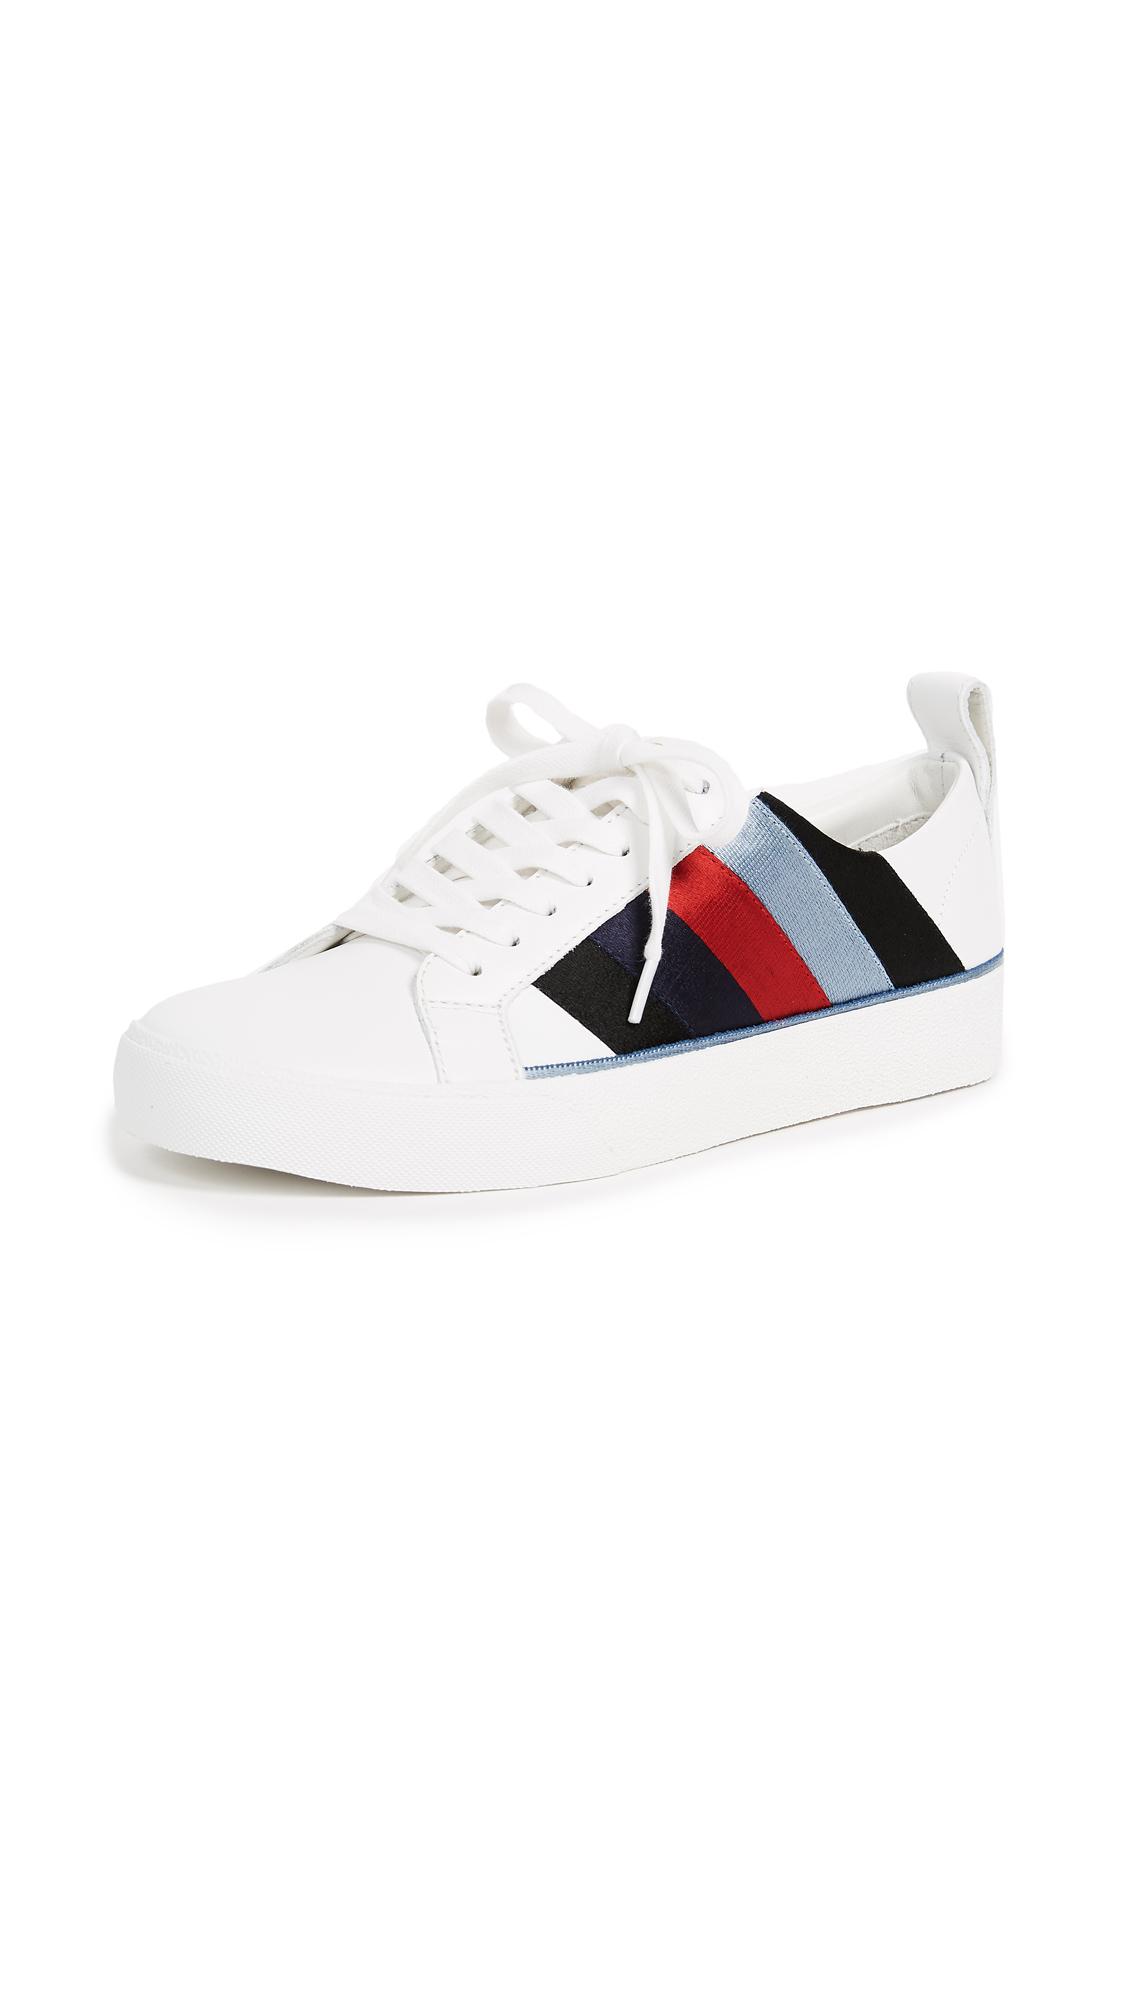 Diane von Furstenberg Tess Sneakers - White/Lipstick